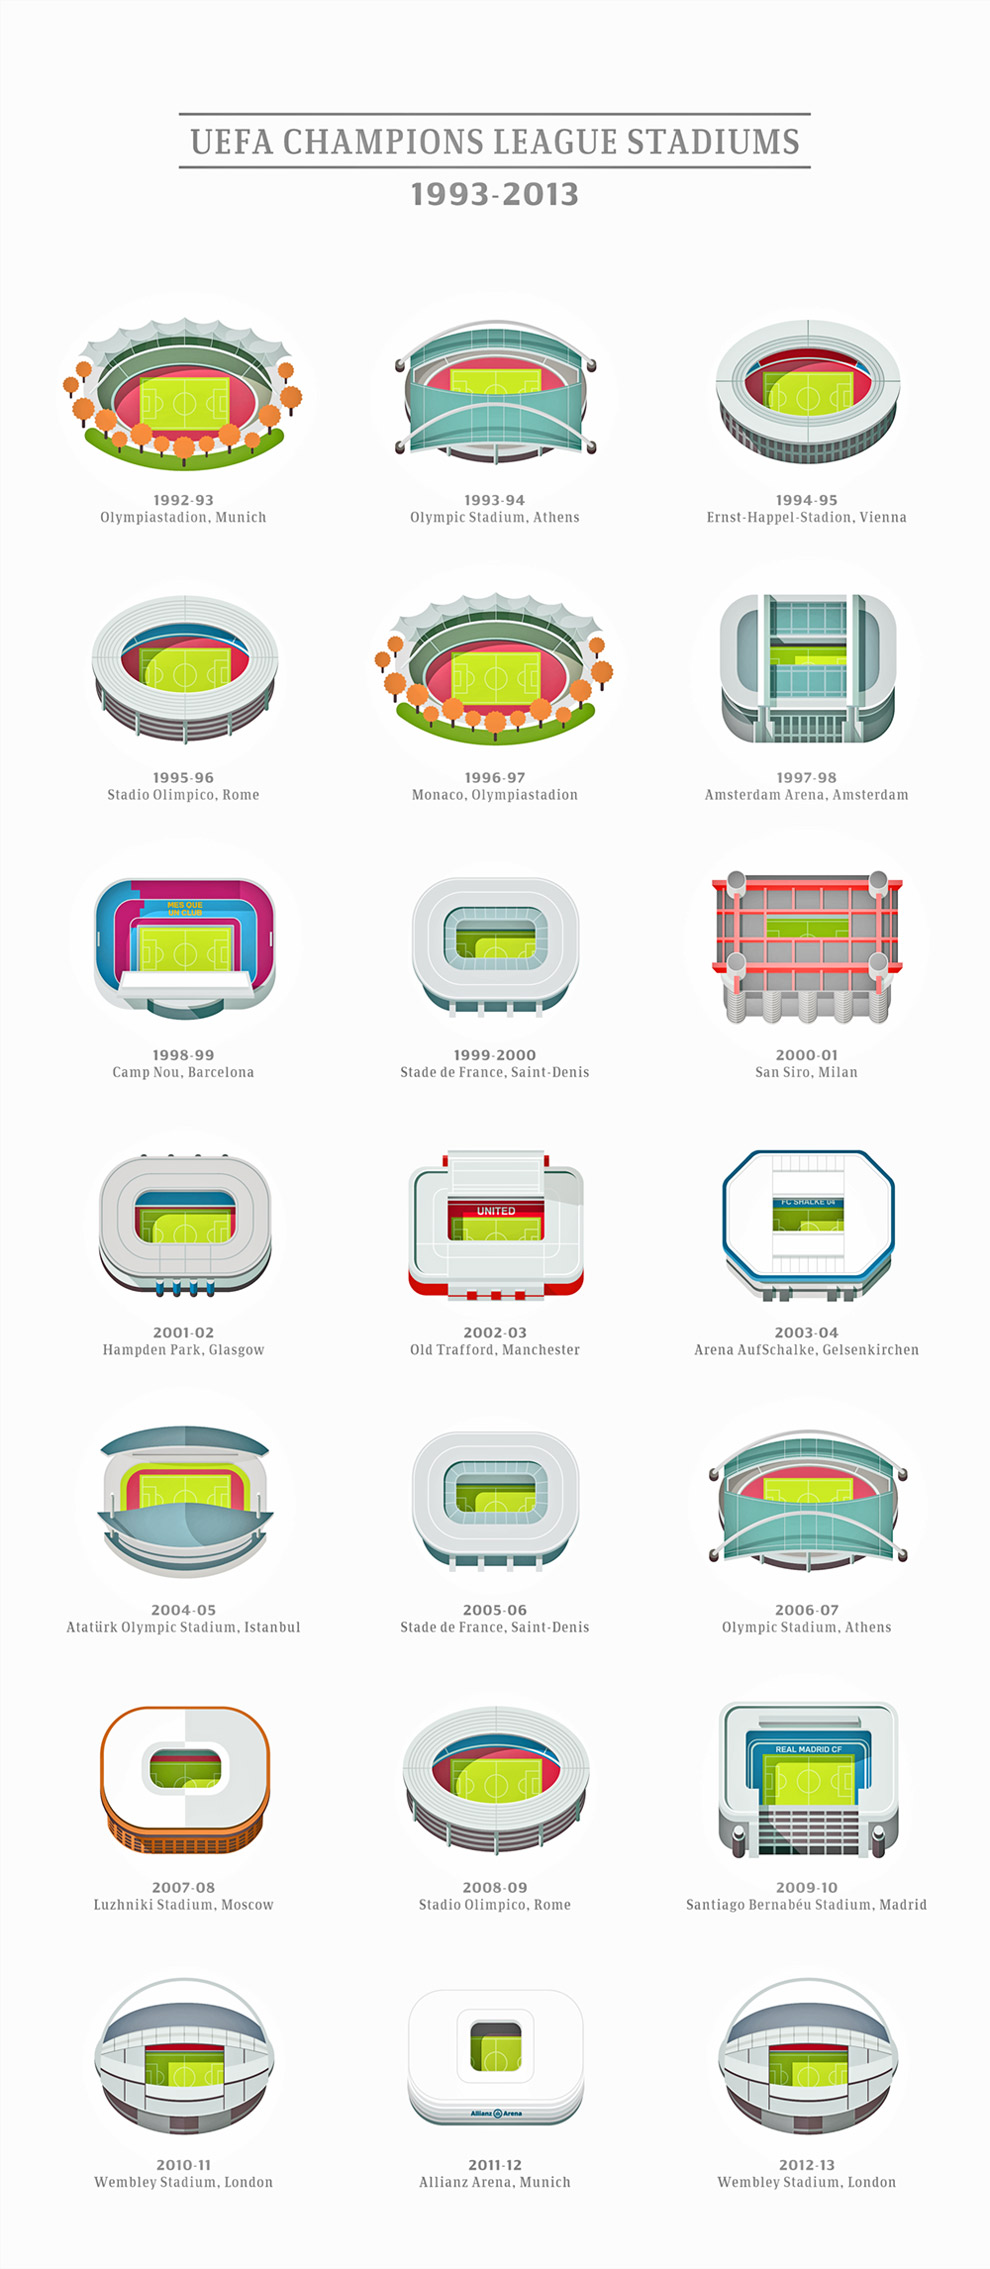 uefa-champions-league-stadiums.jpg